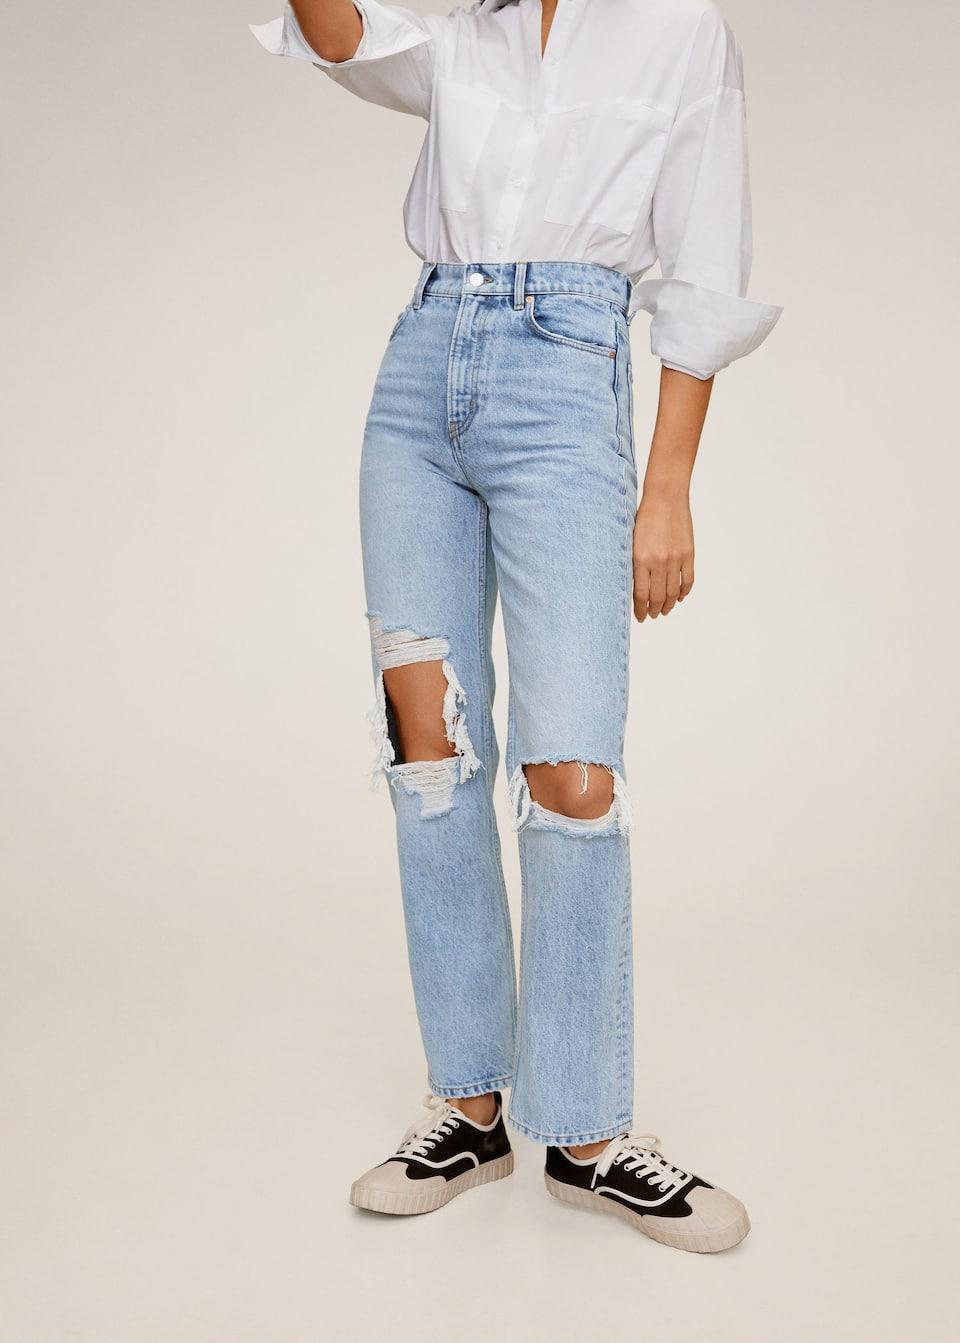 mango jeans sverige